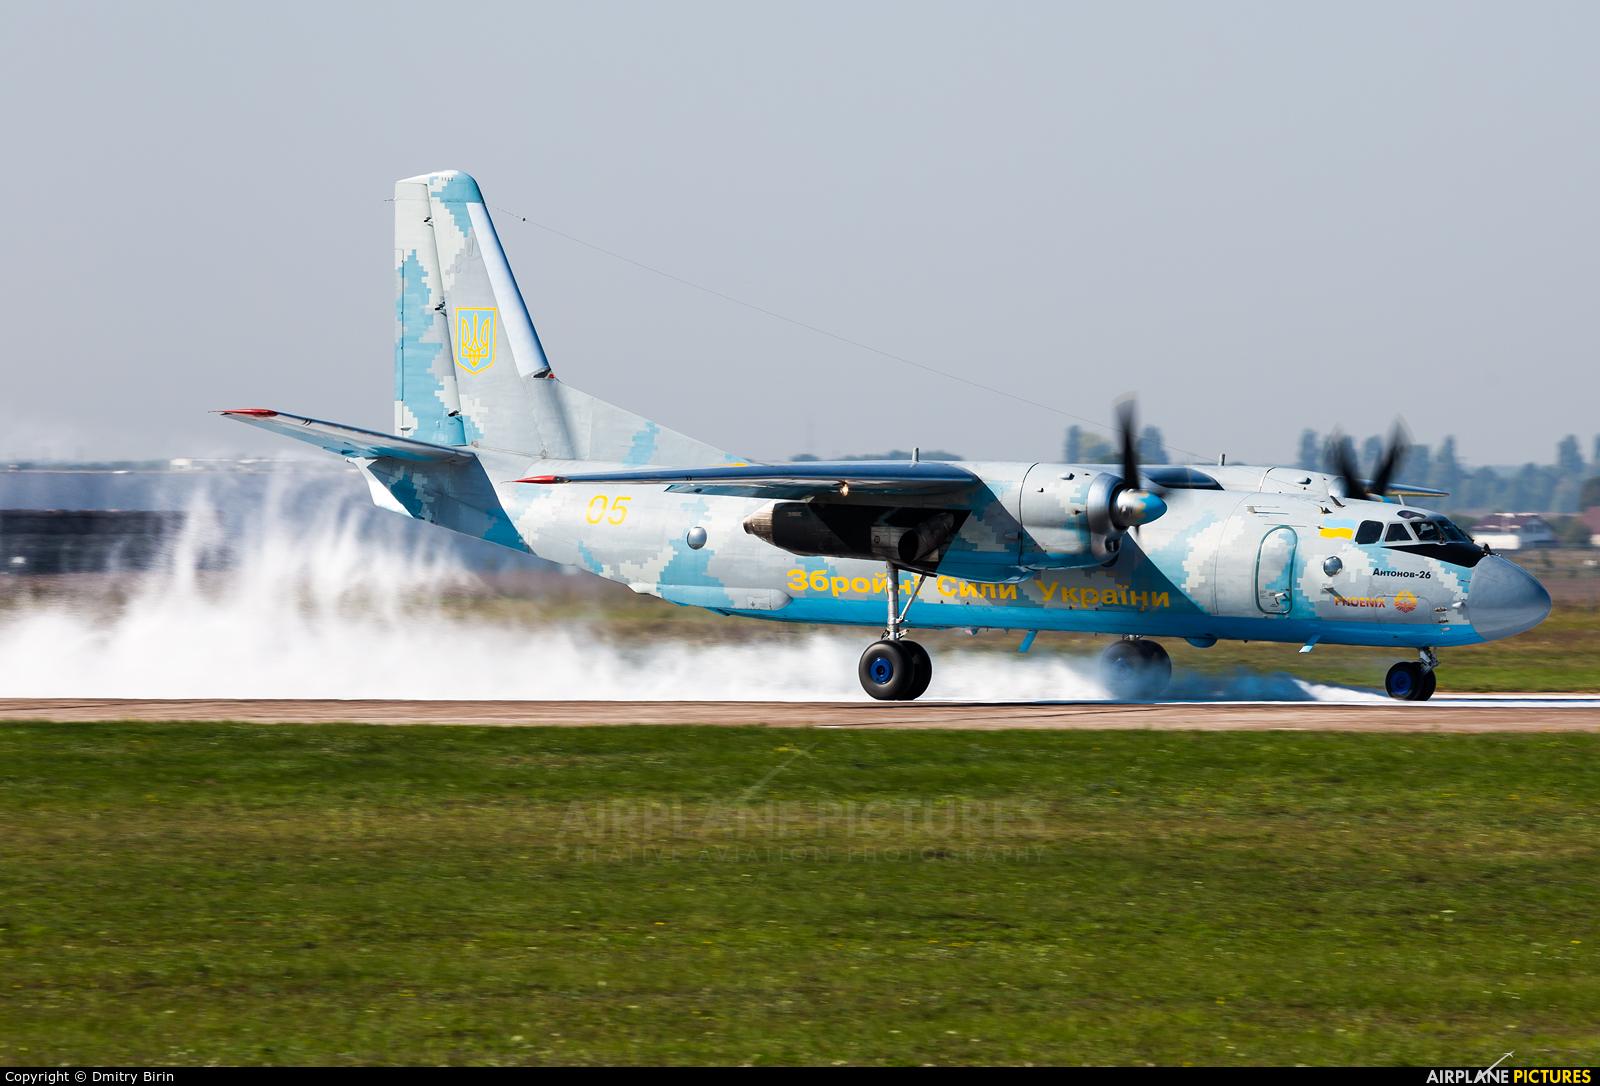 Ukraine - Air Force 05 YELLOW aircraft at Kiev - Borispol